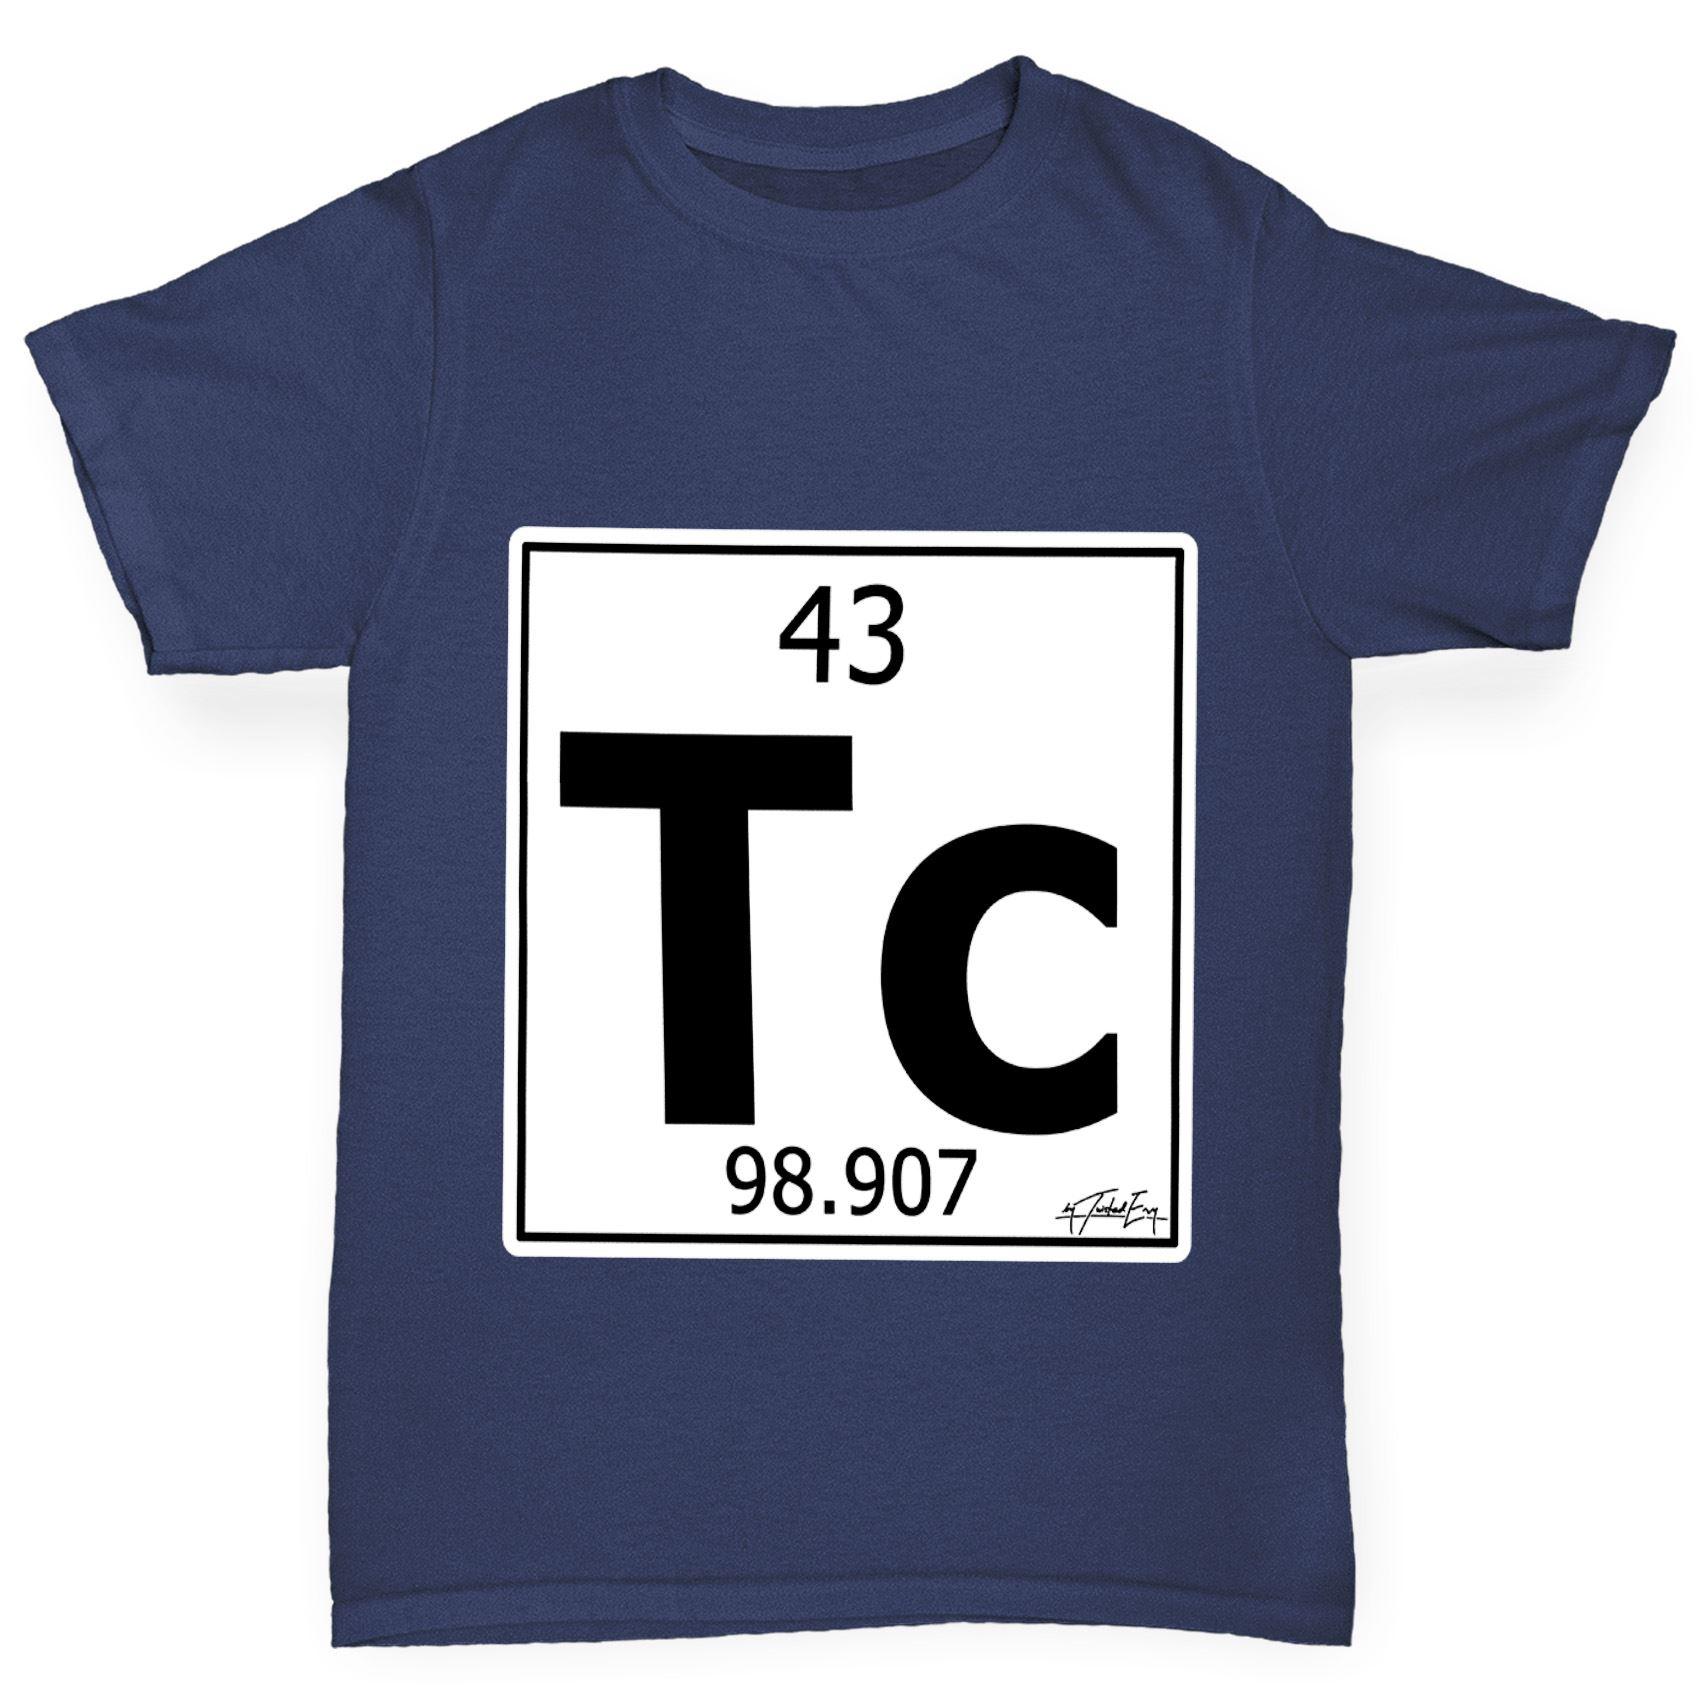 Twisted envy boys periodic table element tc technetium t shirt ebay twisted envy boy 039 s periodic table element urtaz Images